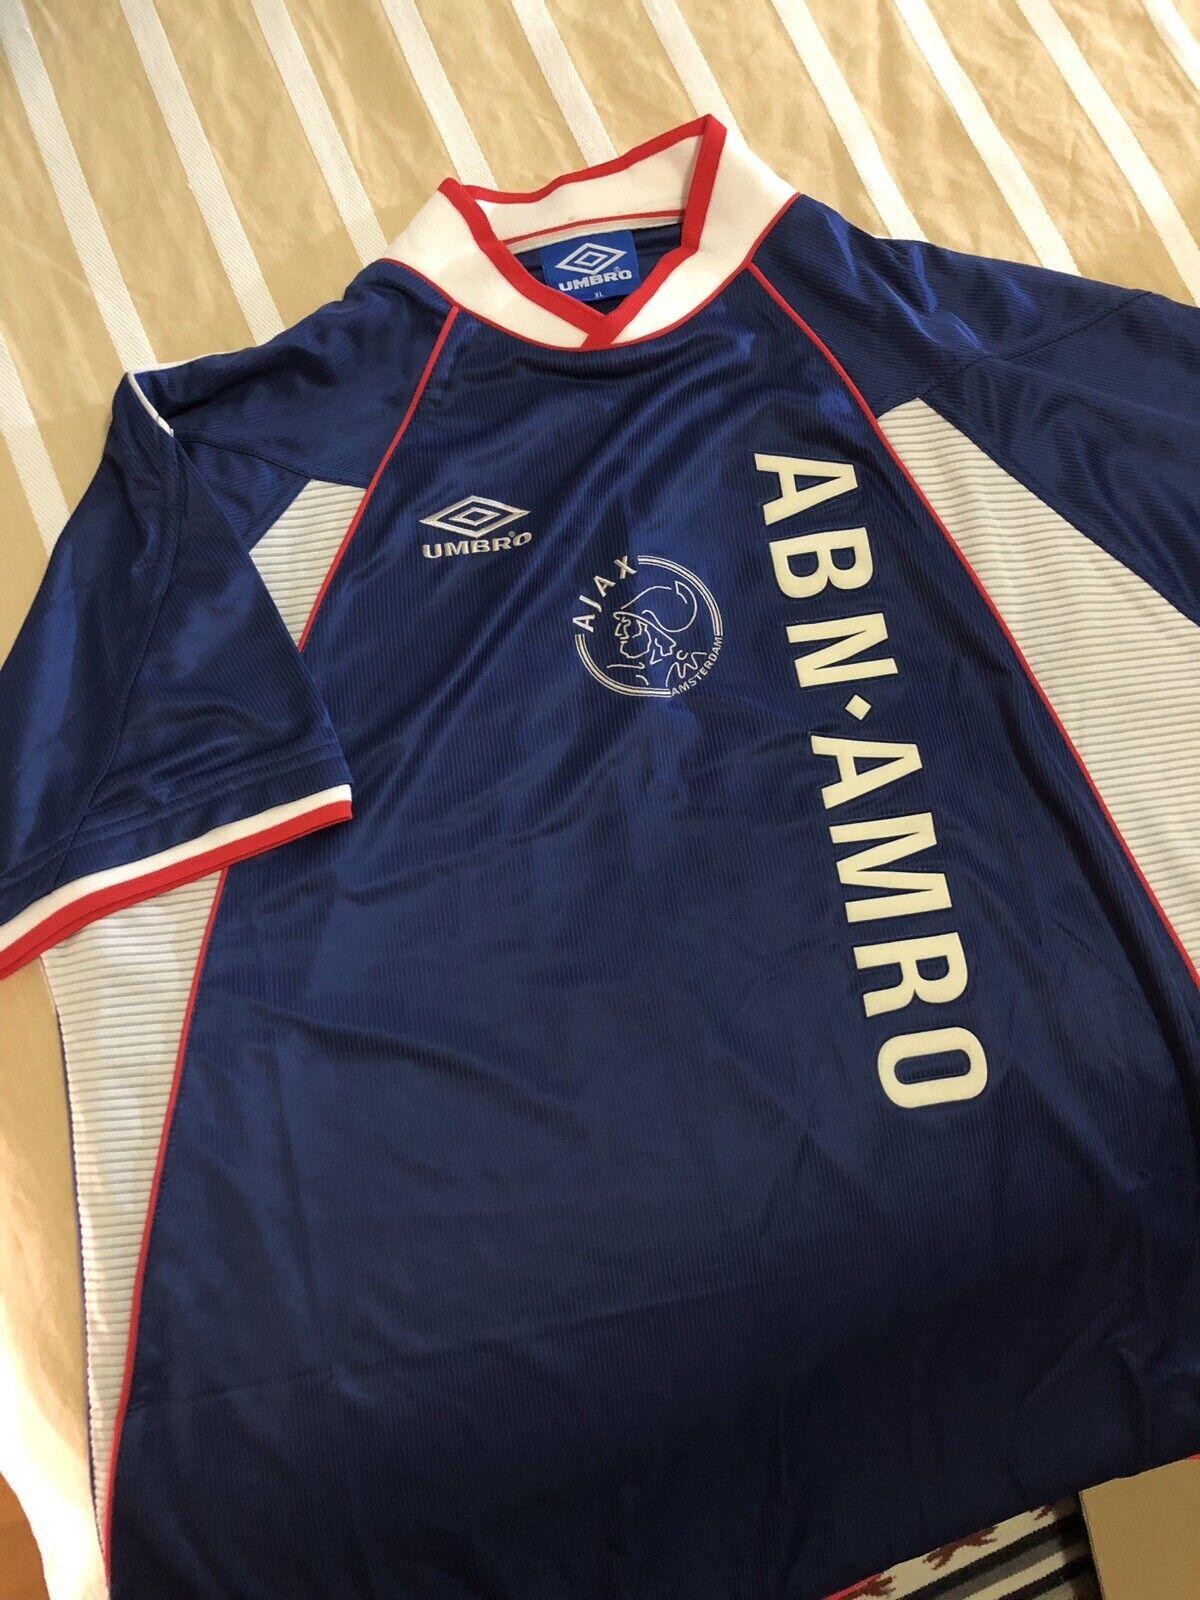 Genuine Umbro Vintage Ajax footbal shirt Dimensione XL